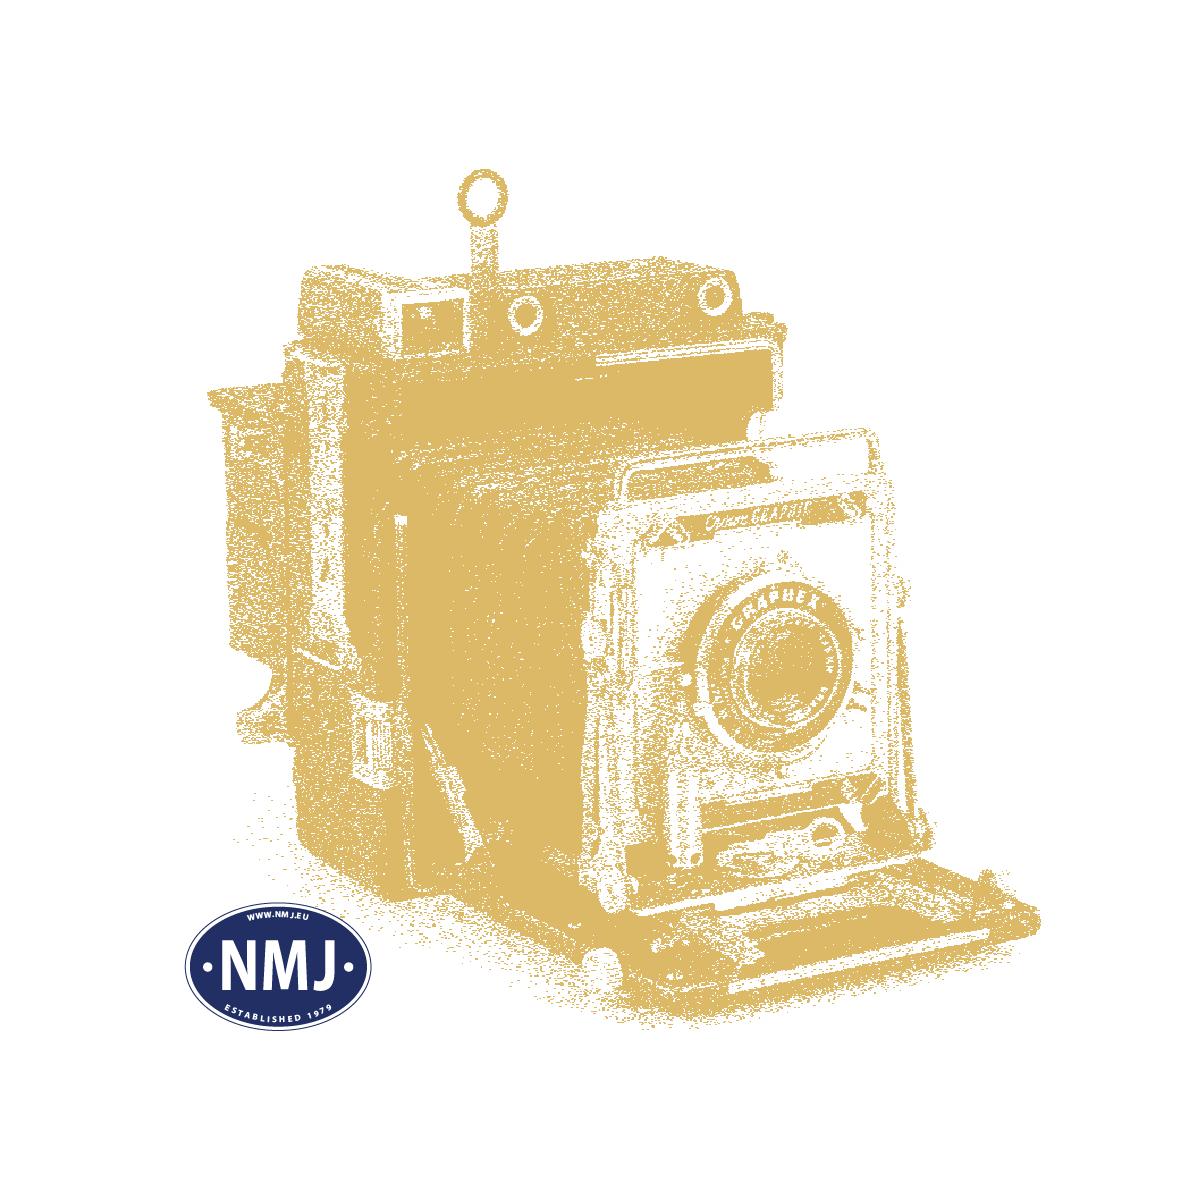 NMJT245001 - NMJ Topline NSB DI3.602 Grünn, Spur 0, DCC m/ Sound